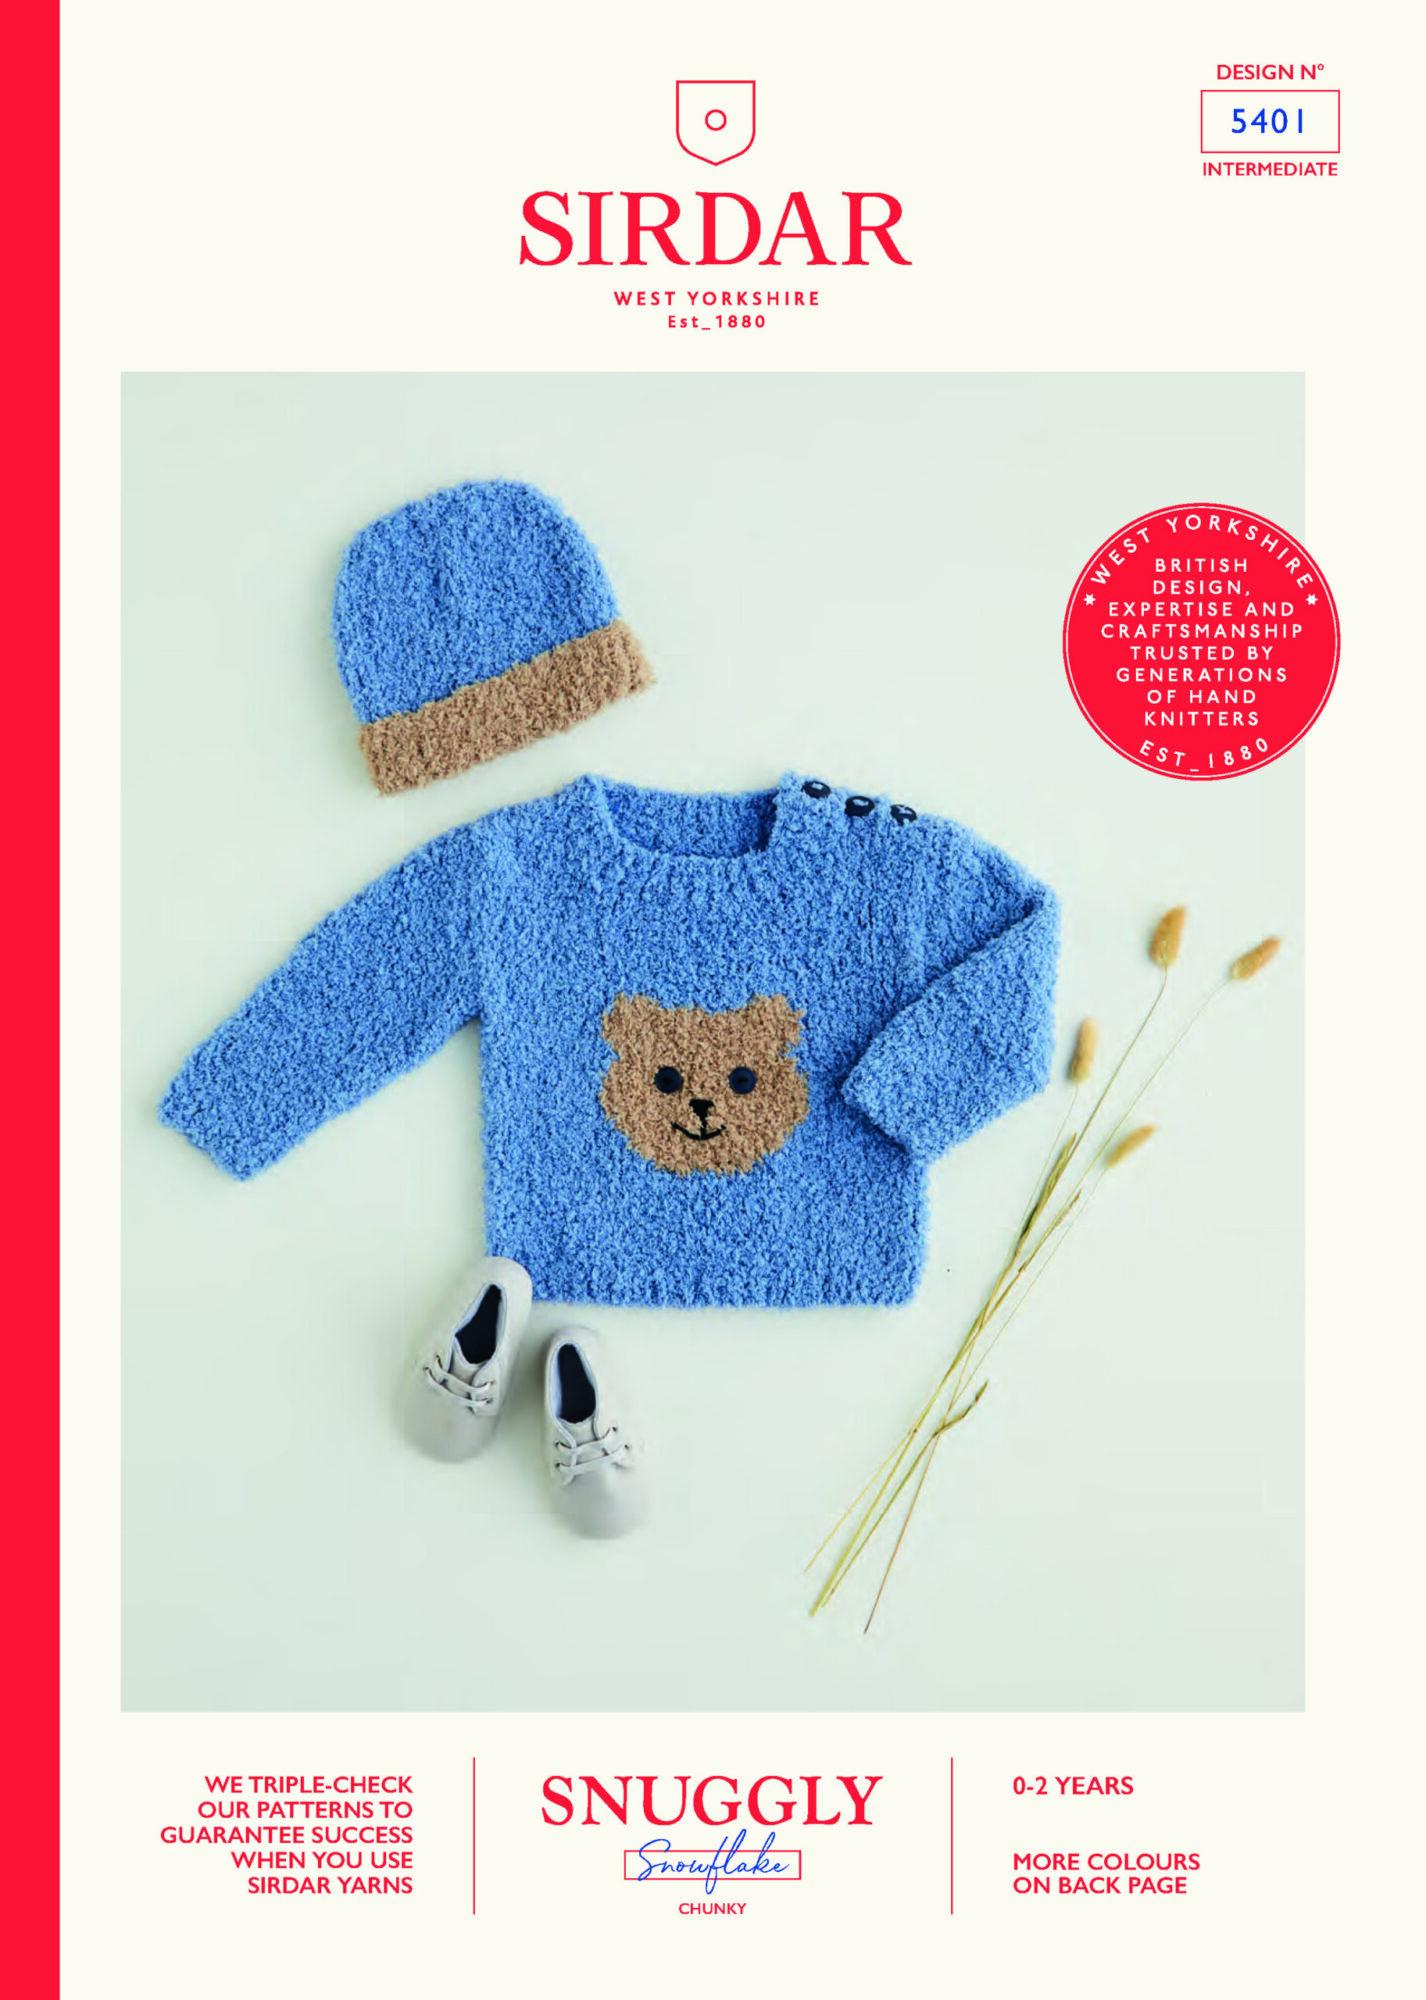 Sirdar Pattern Snowflake  5401 (Download) product image